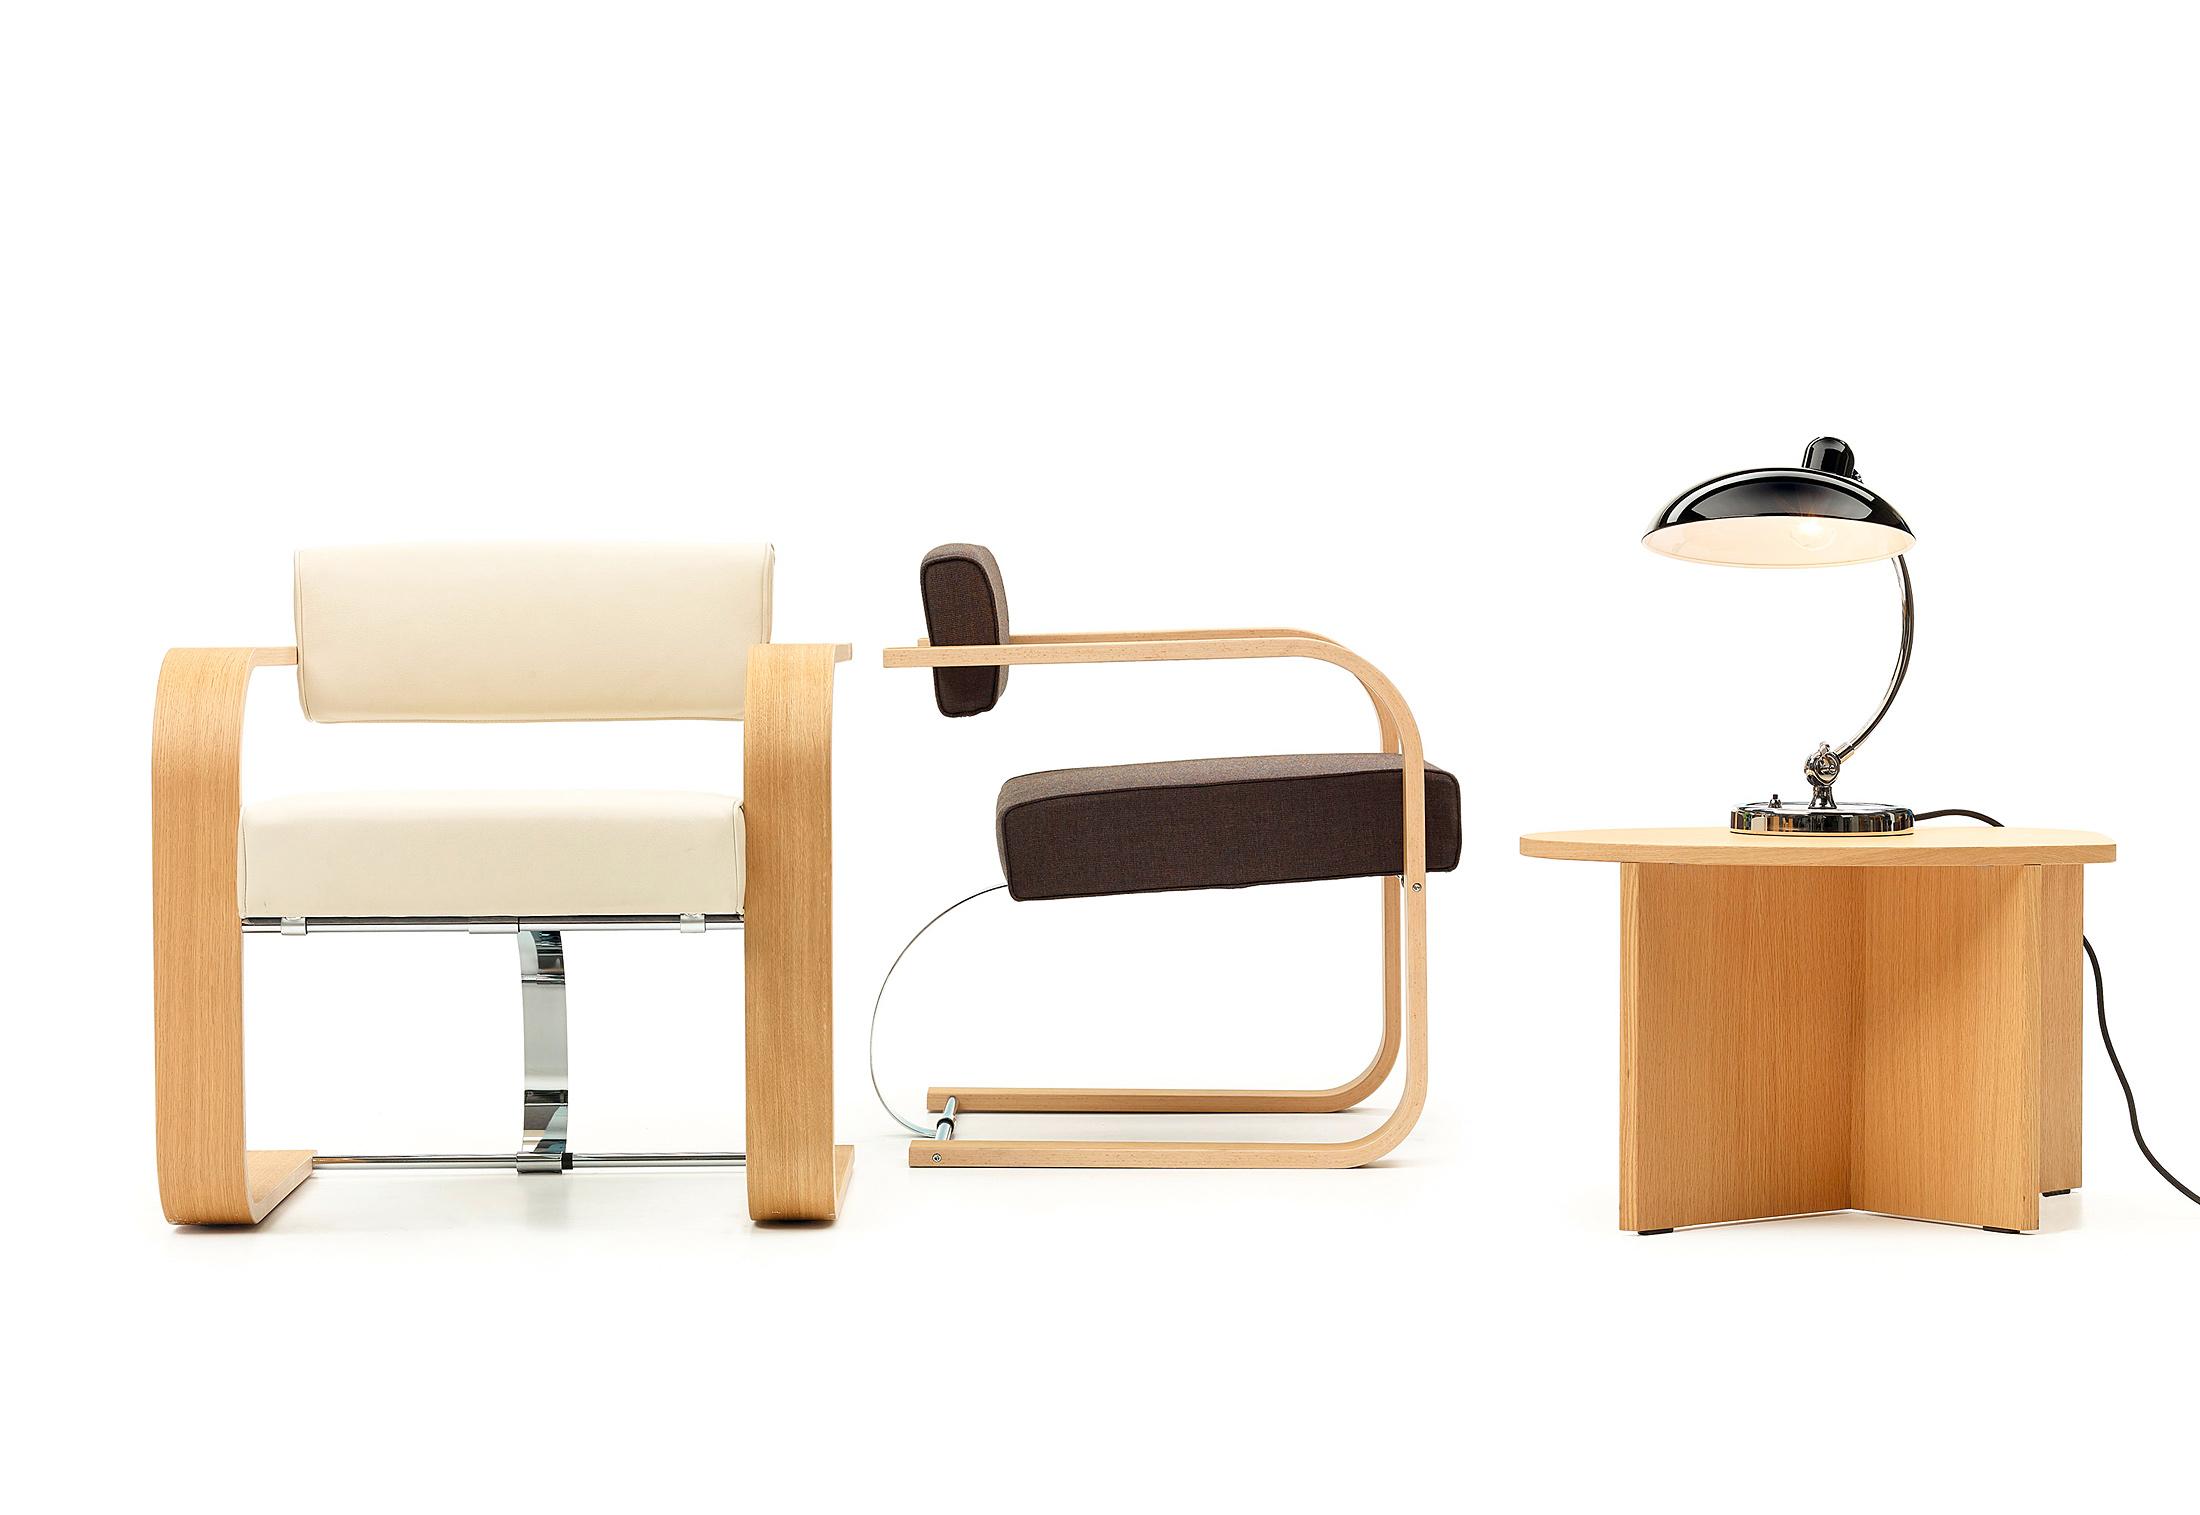 Richard_Neutra_VS_cantilever_chair_wood_